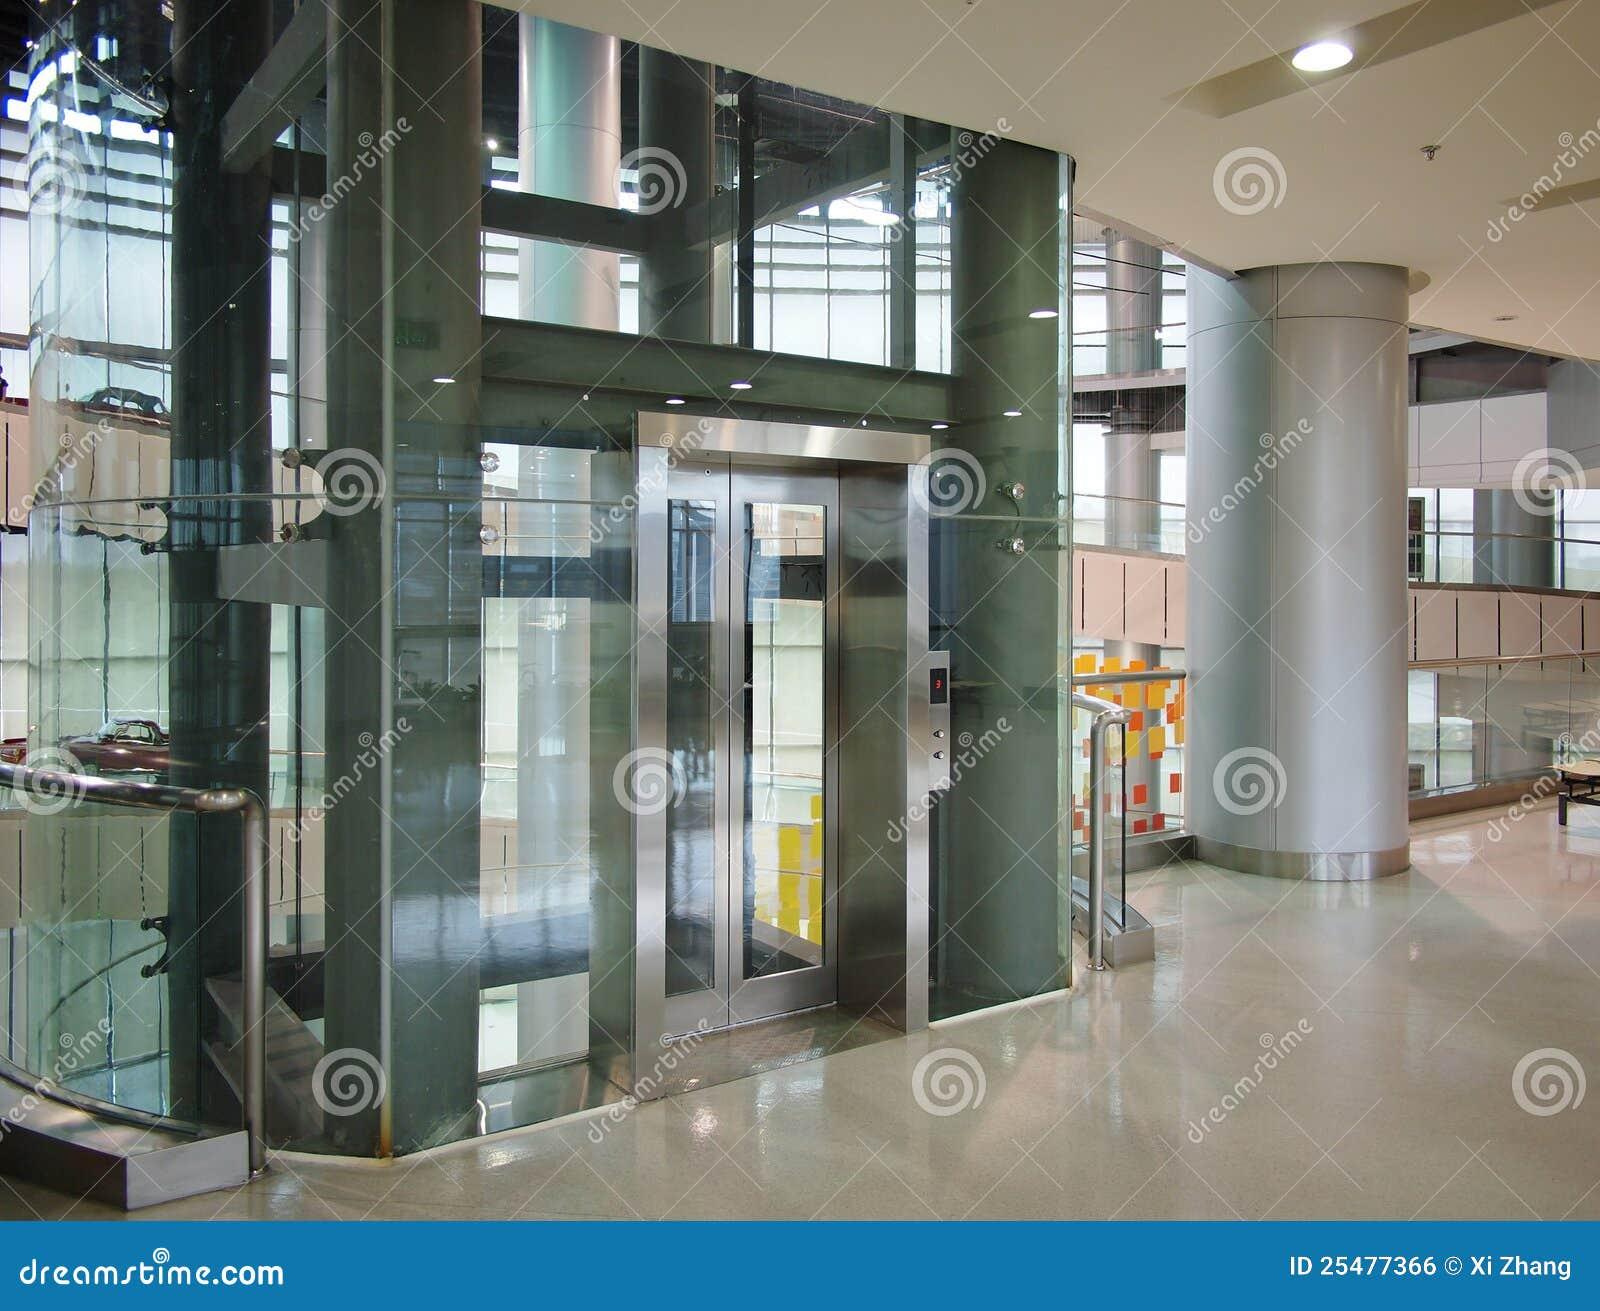 Glass Elevator Royalty Free Stock Image Image 25477366